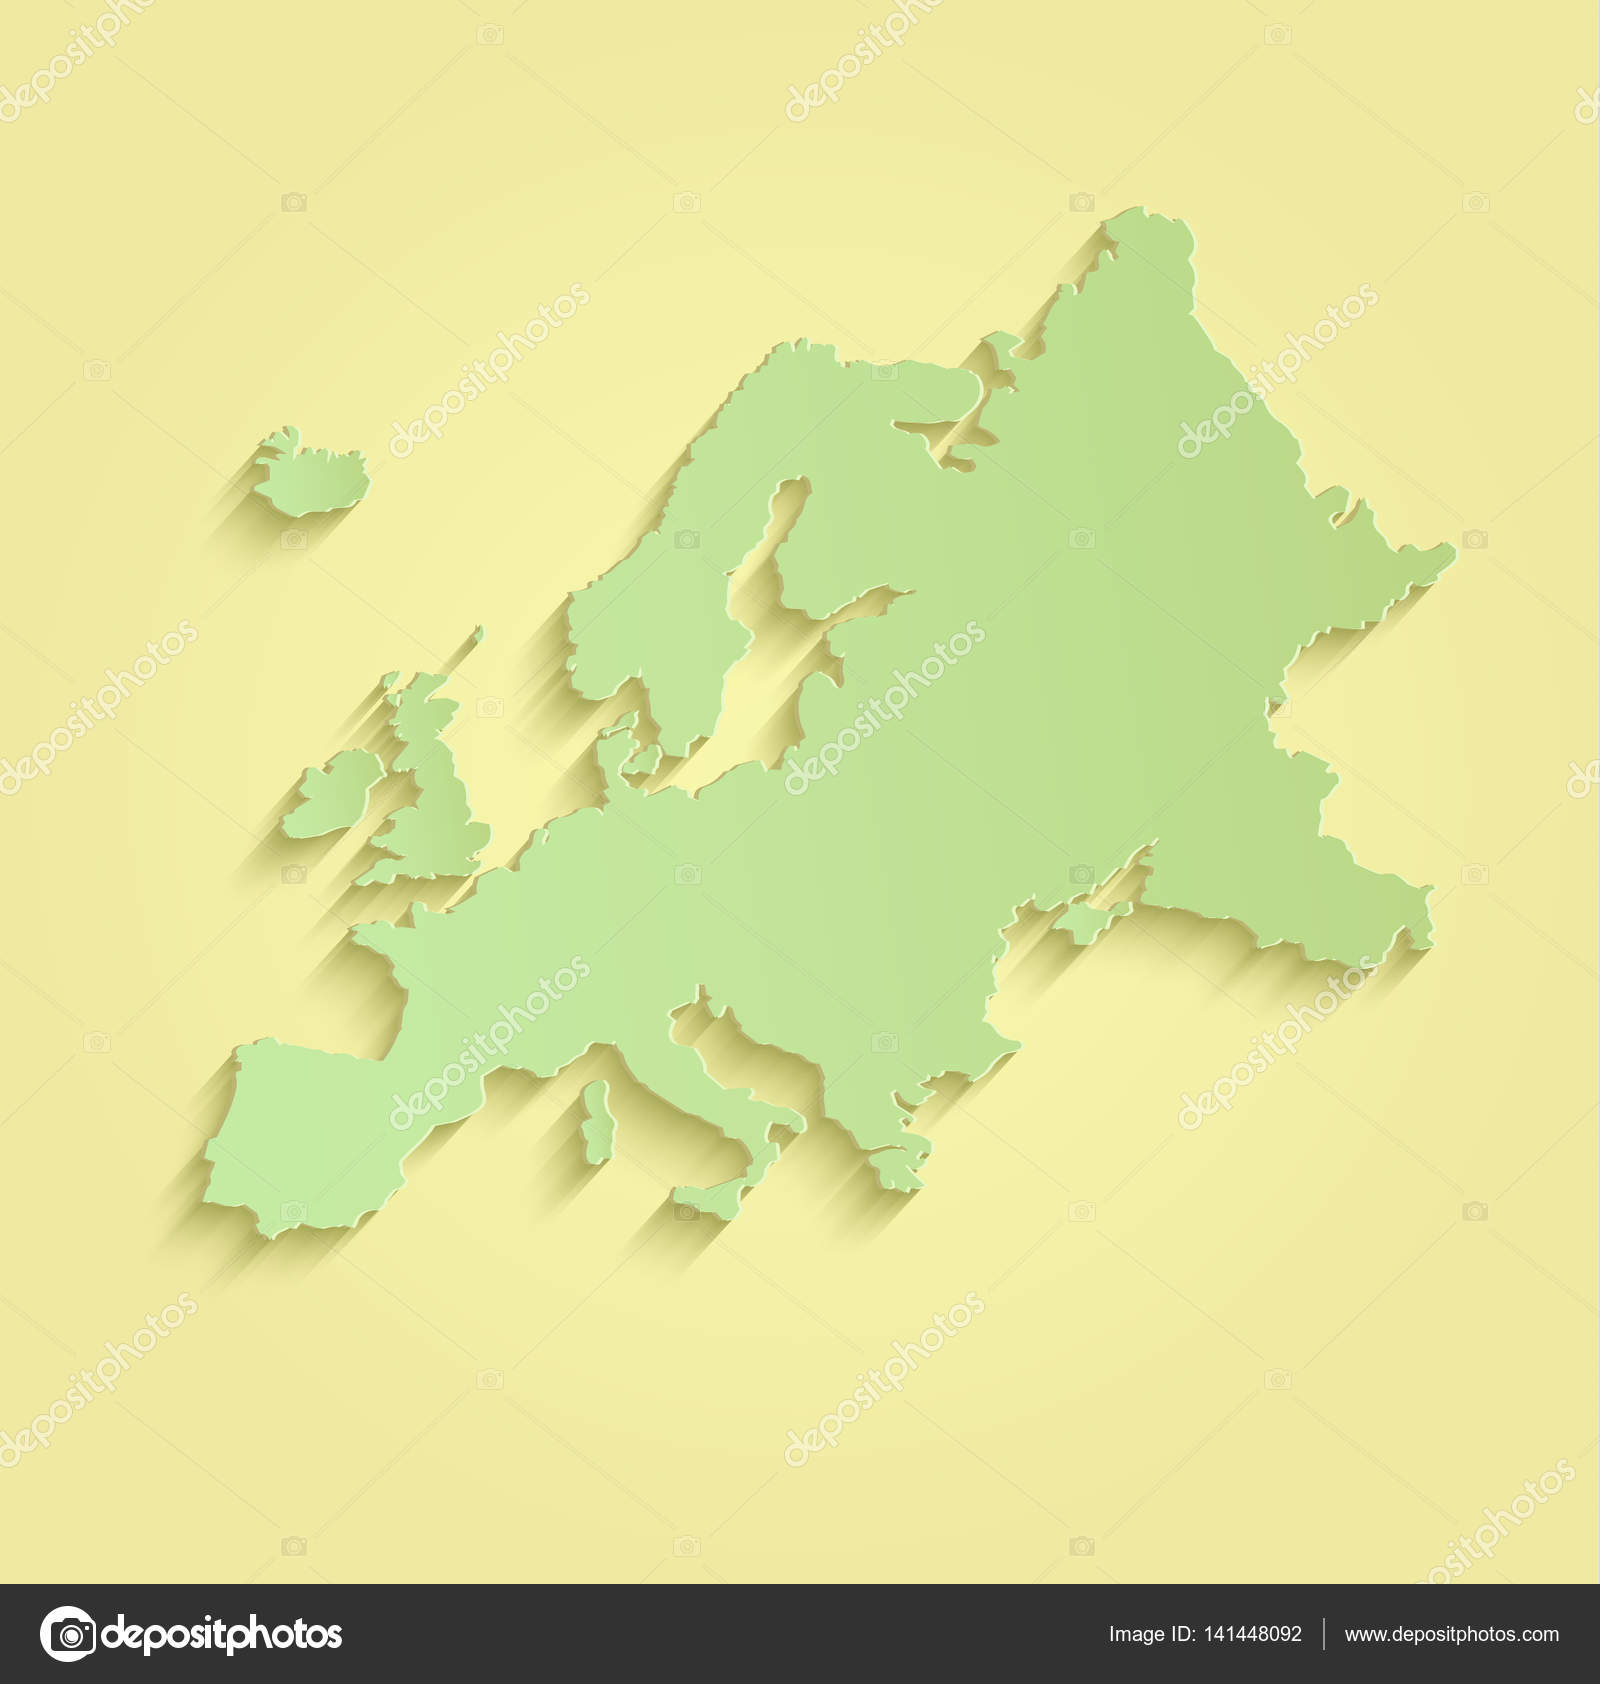 Europe Map Yellow Green Raster Blank Stock Photo Mondih - Blank world map green